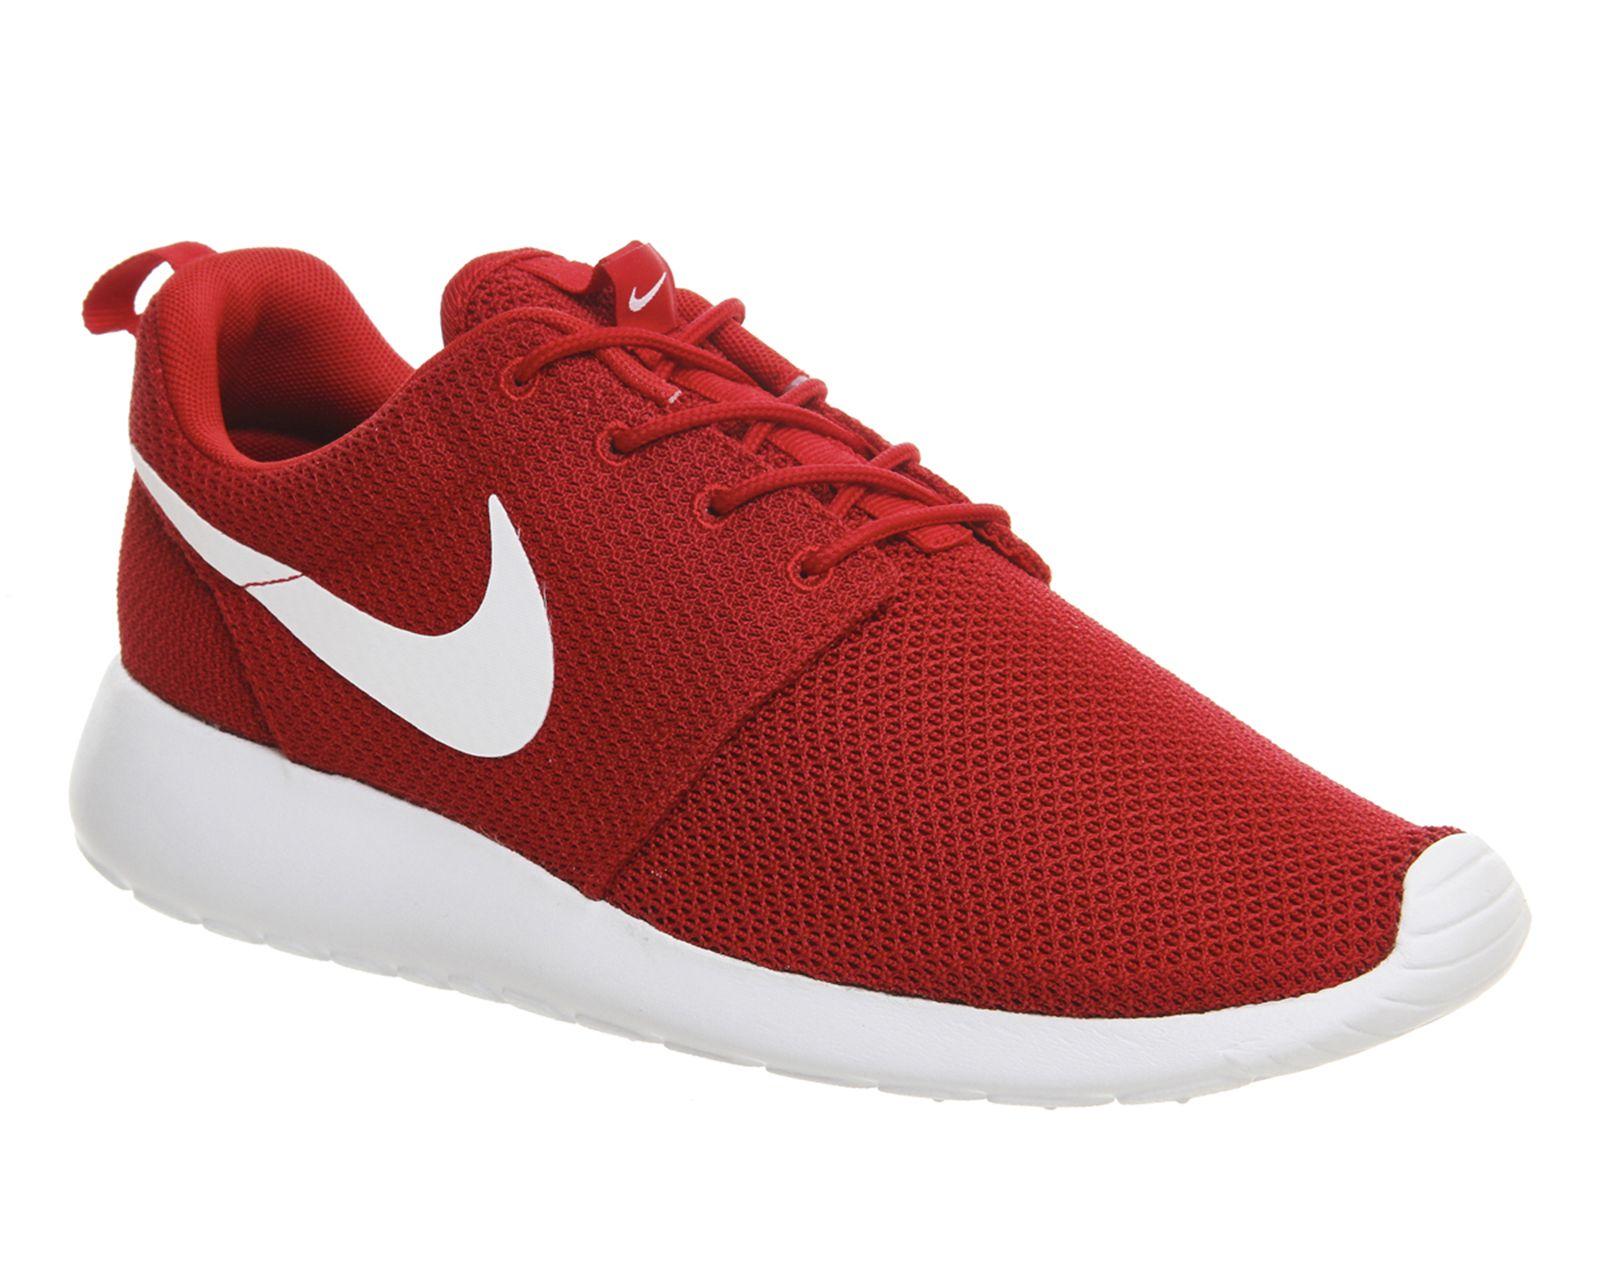 Nike Roshe Run Gym Red - Unisex Sports